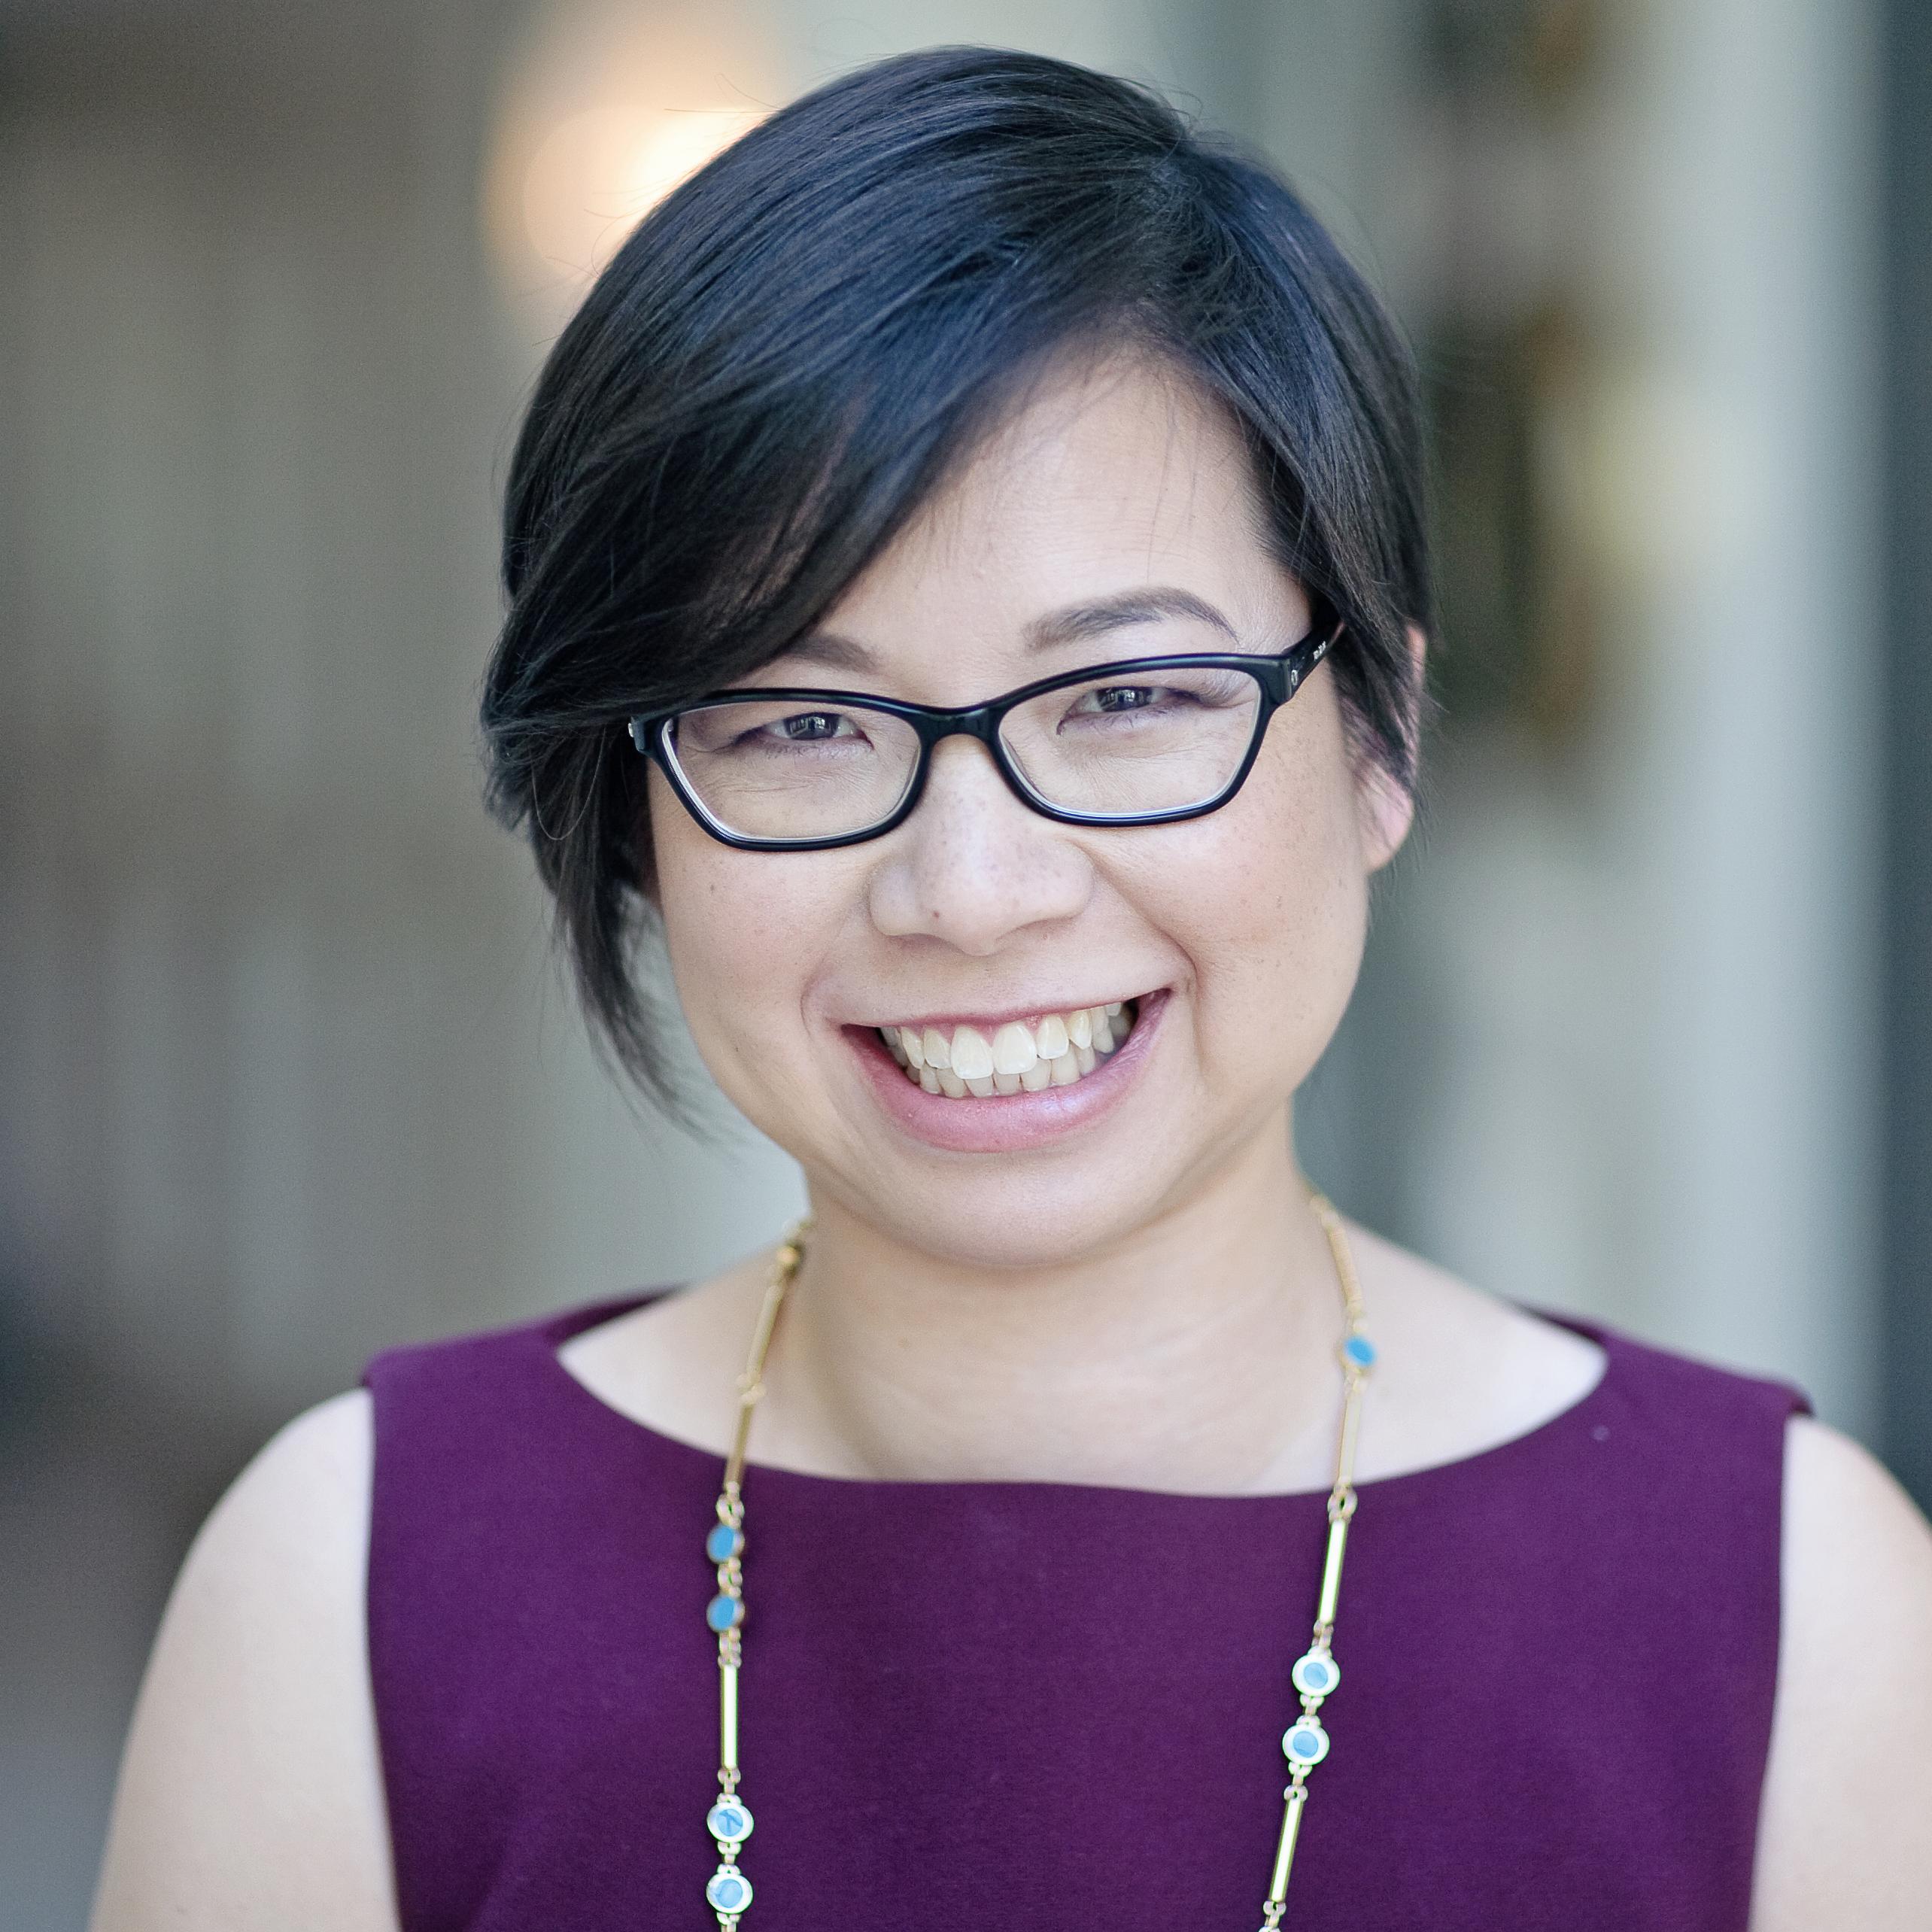 Stella Ma, Co-Founder of Little Passports